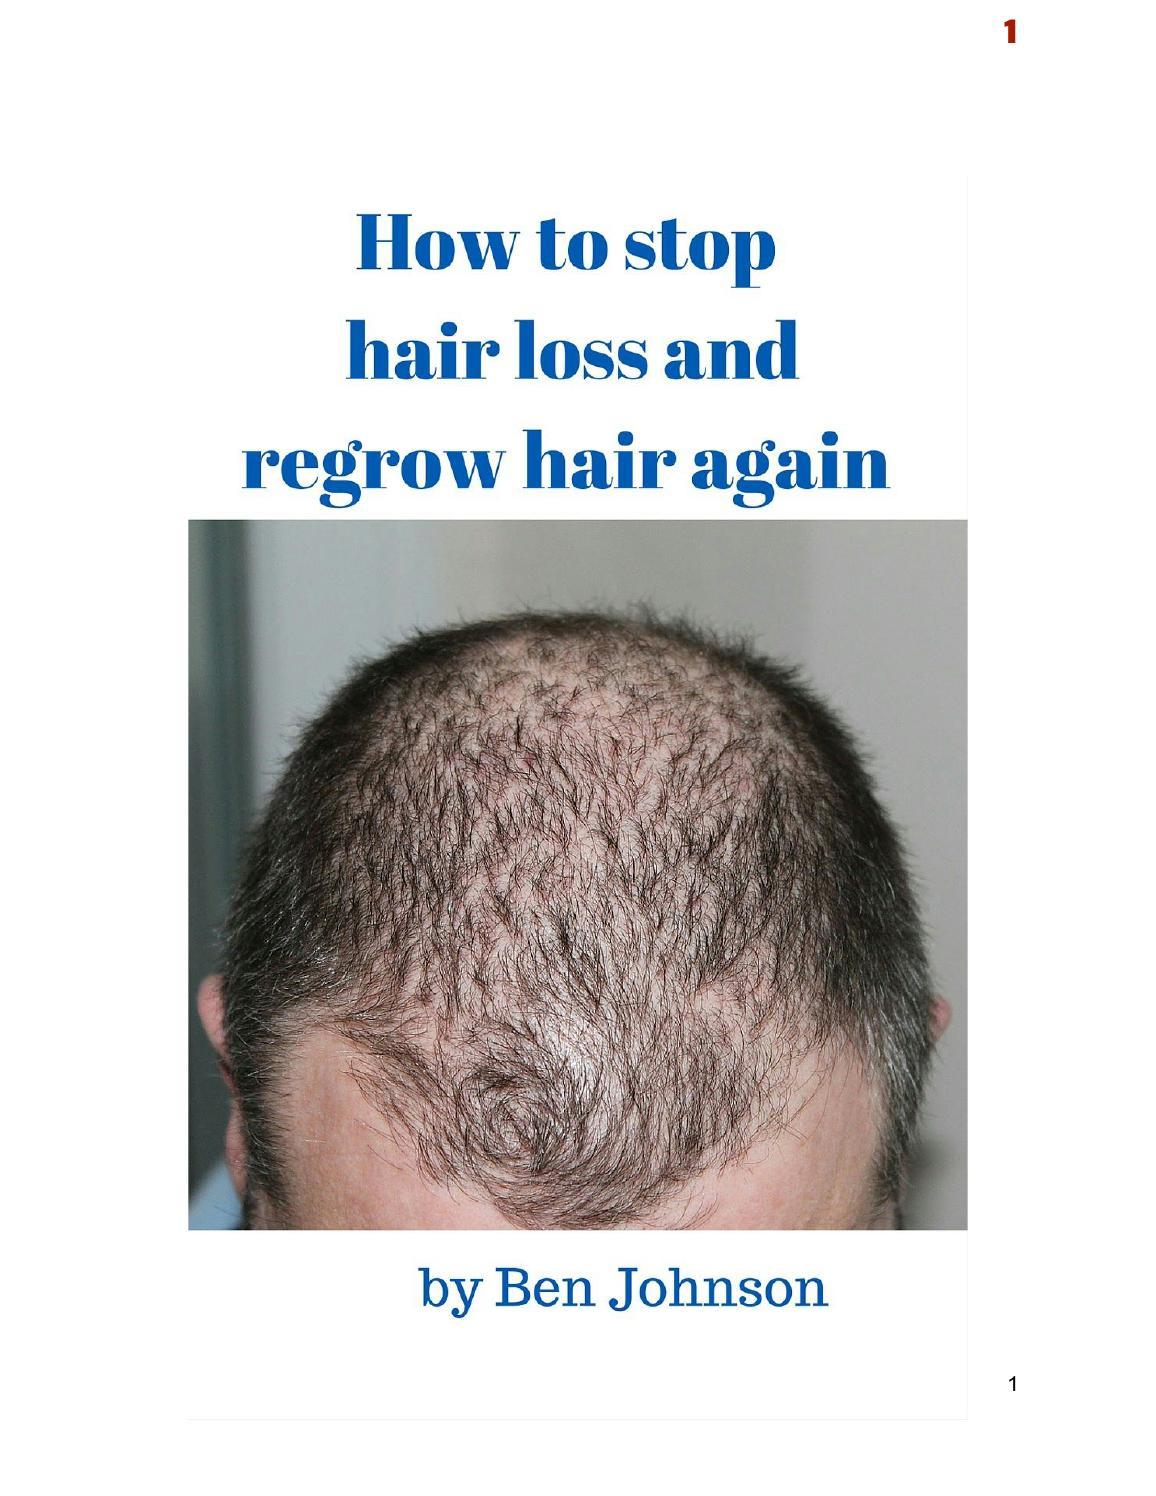 Ways to stop balding